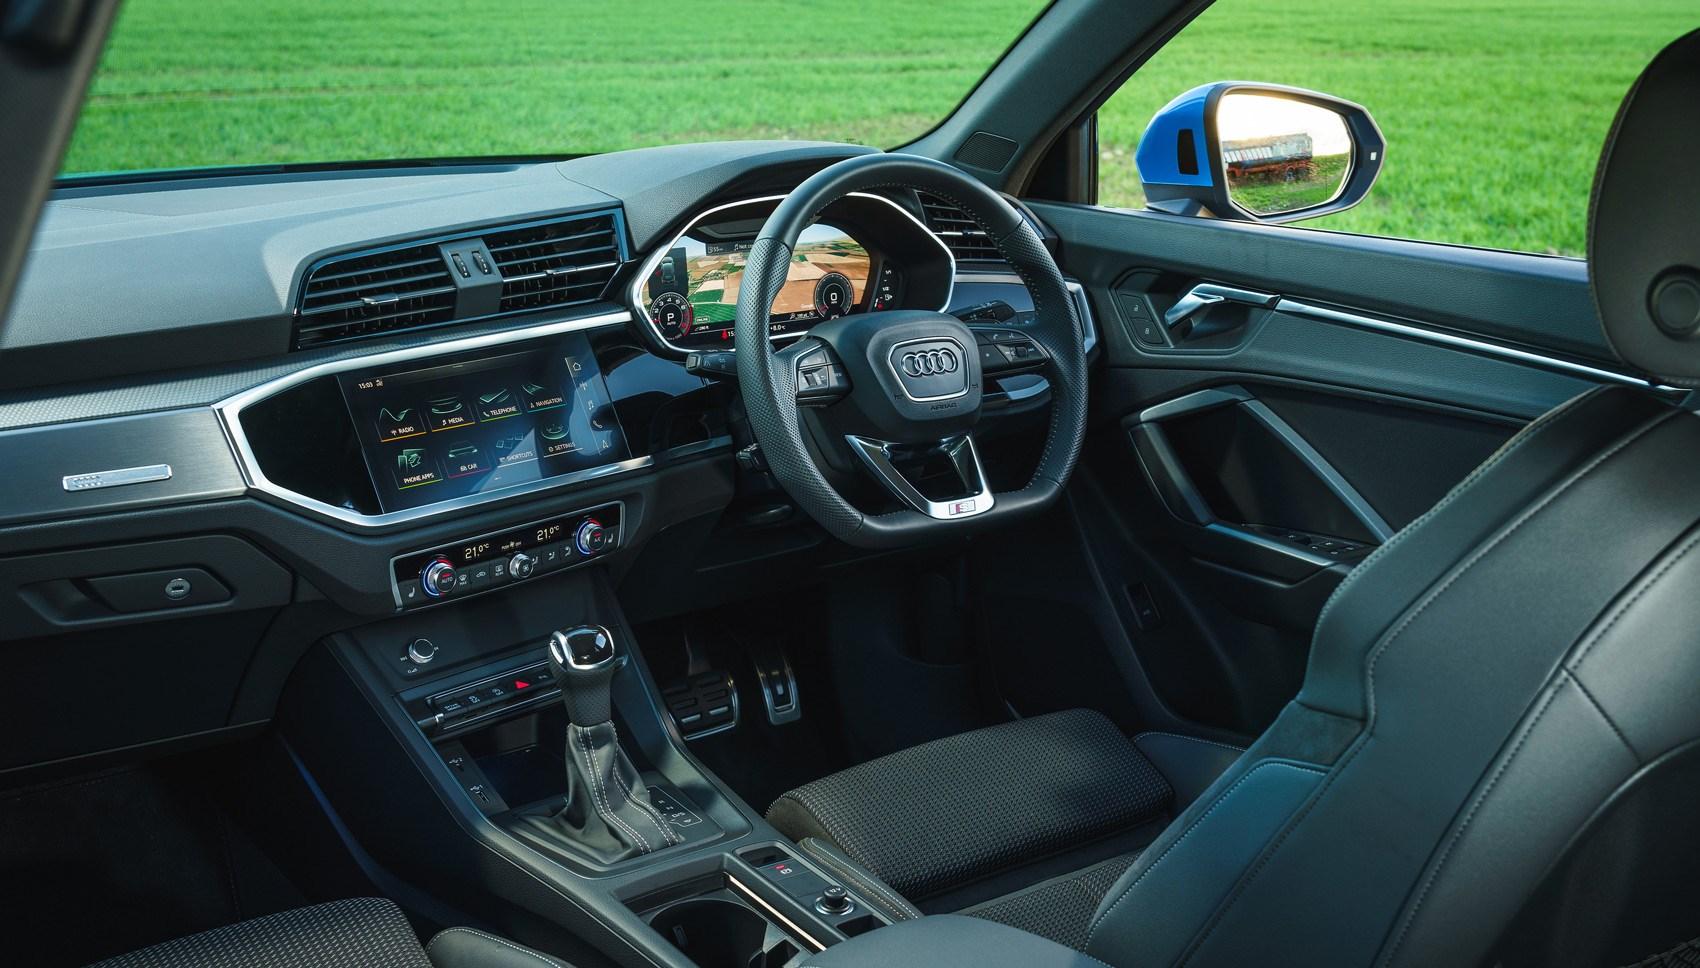 New Audi Q3 (2019) review: master of none | CAR Magazine